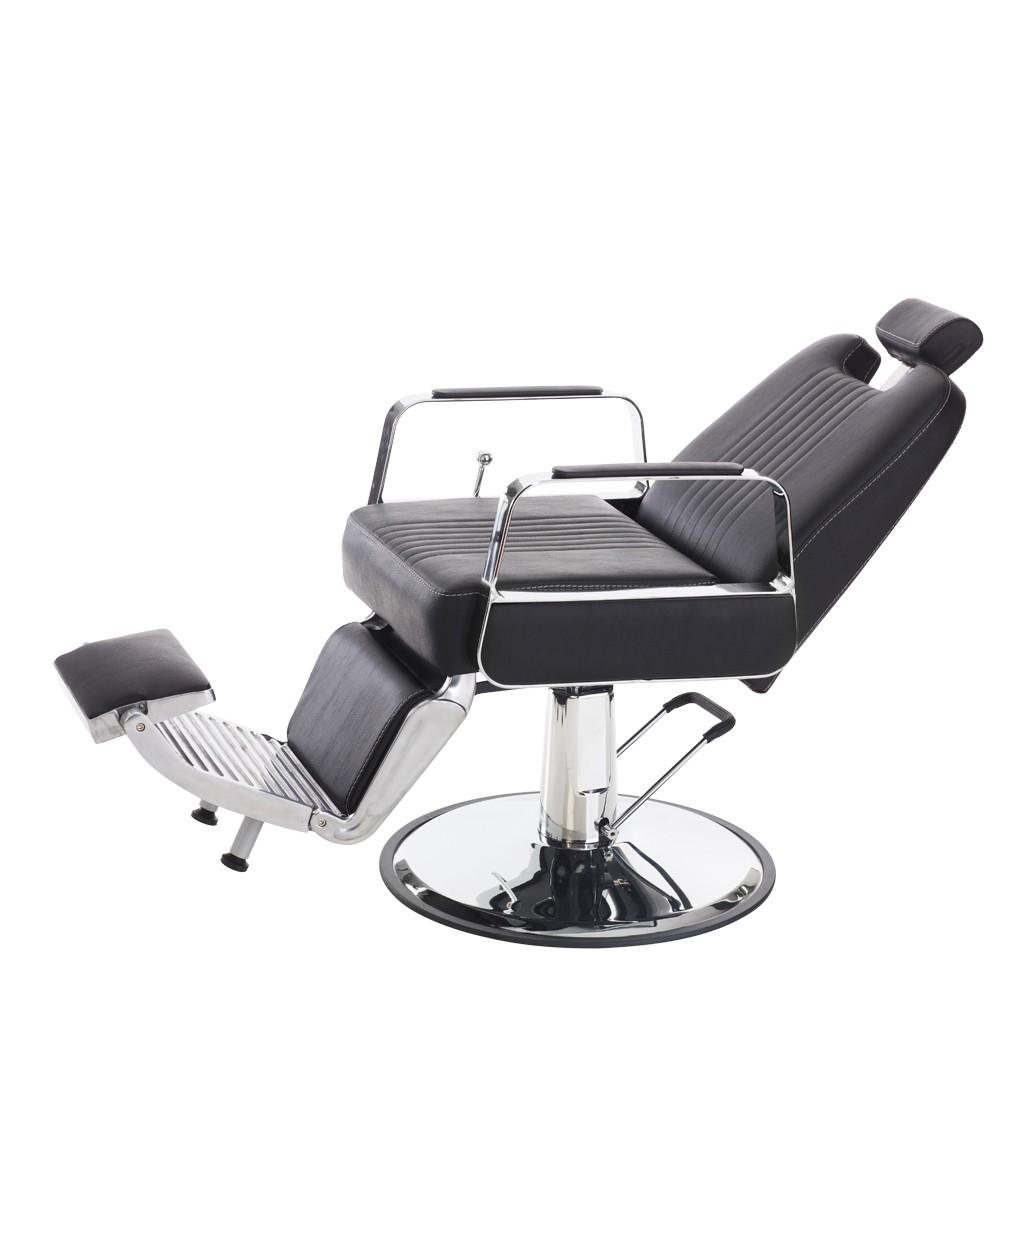 headrest for barber chair leg covers hardwood floors lenox professional adjustable with